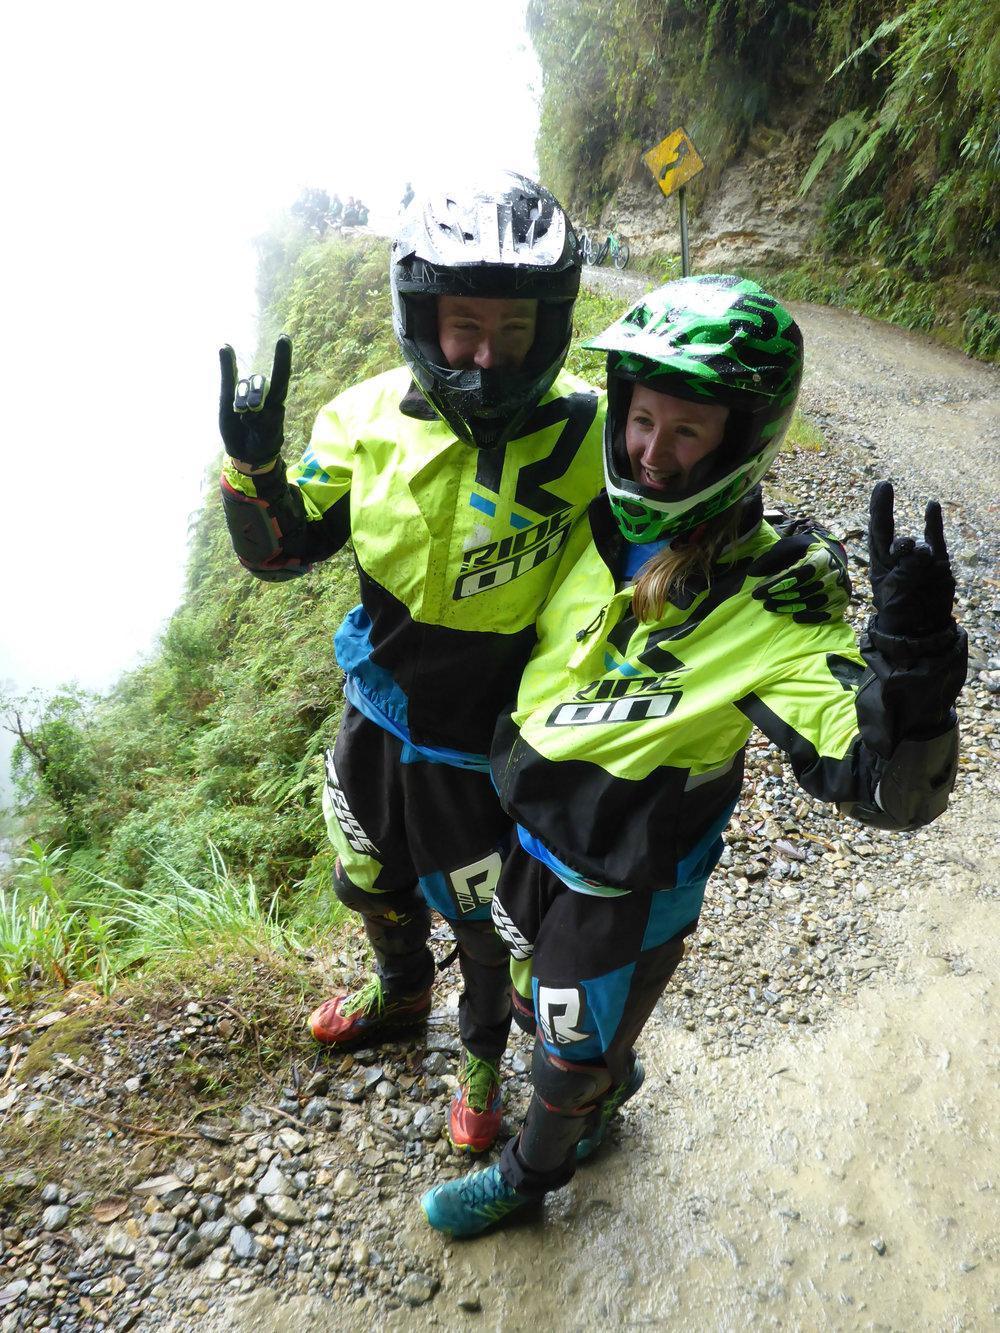 Image courtesy RideOn Bolivia